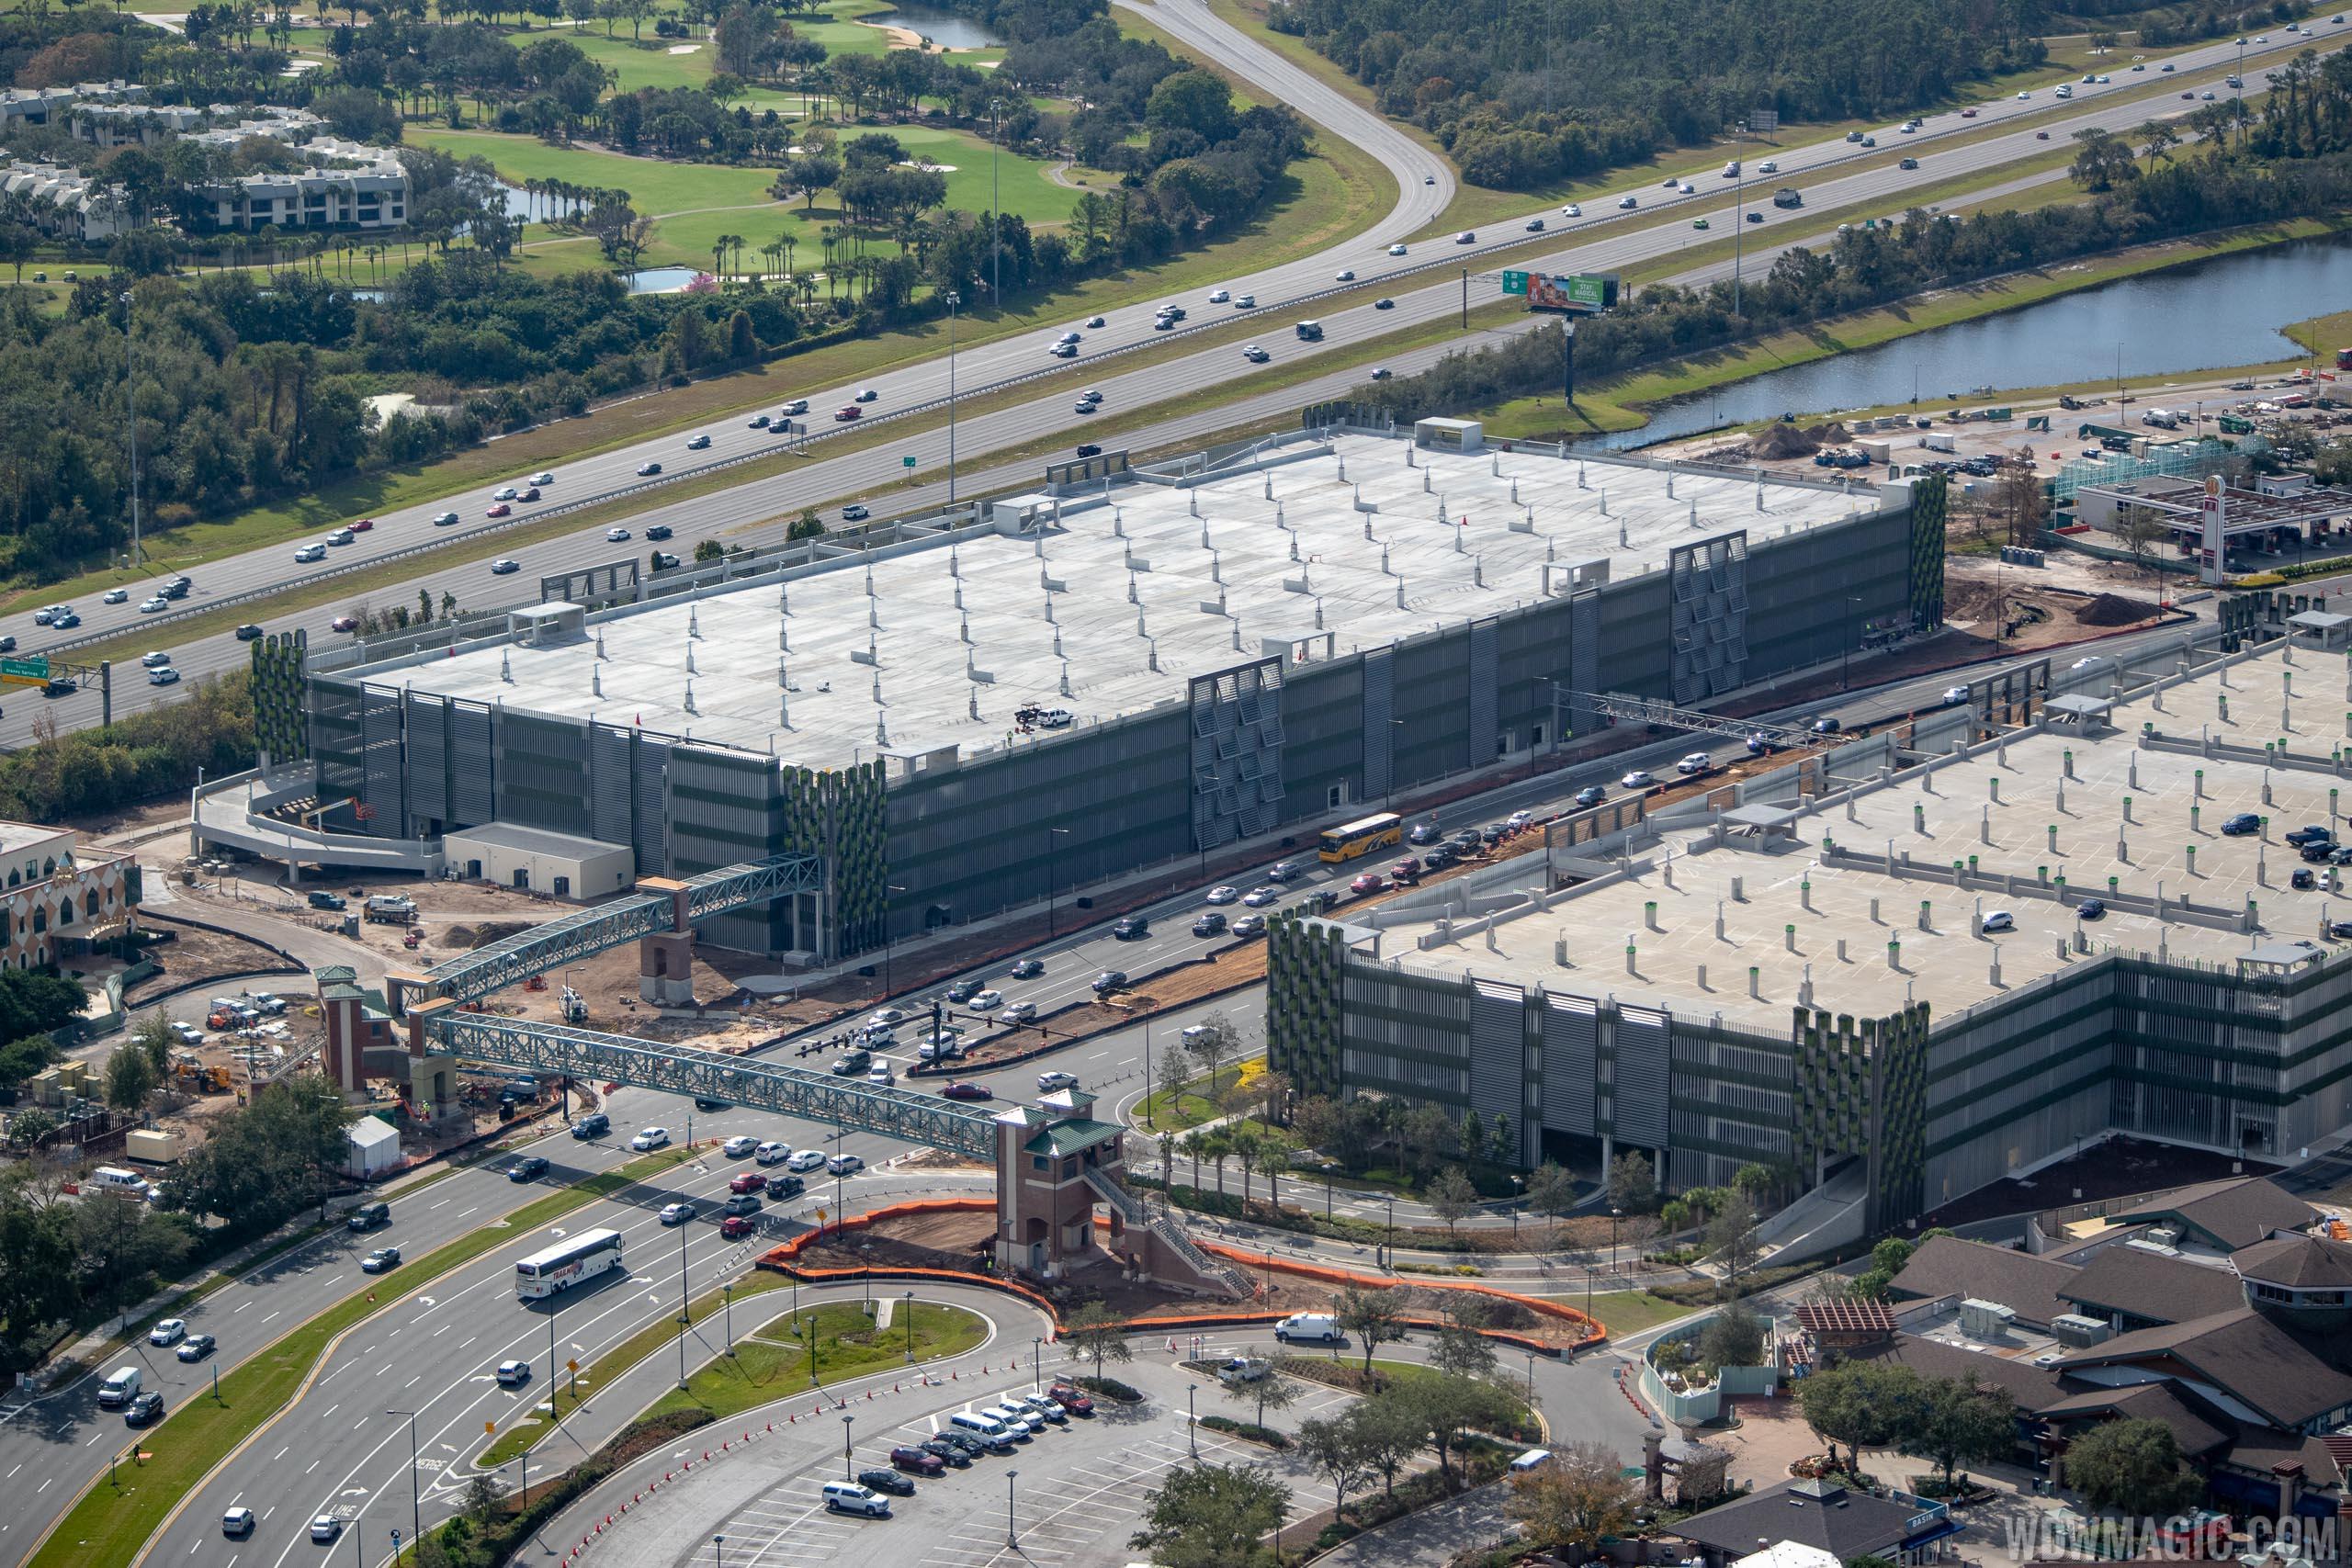 Disney Springs Grapefruit Garage construction - January 2019